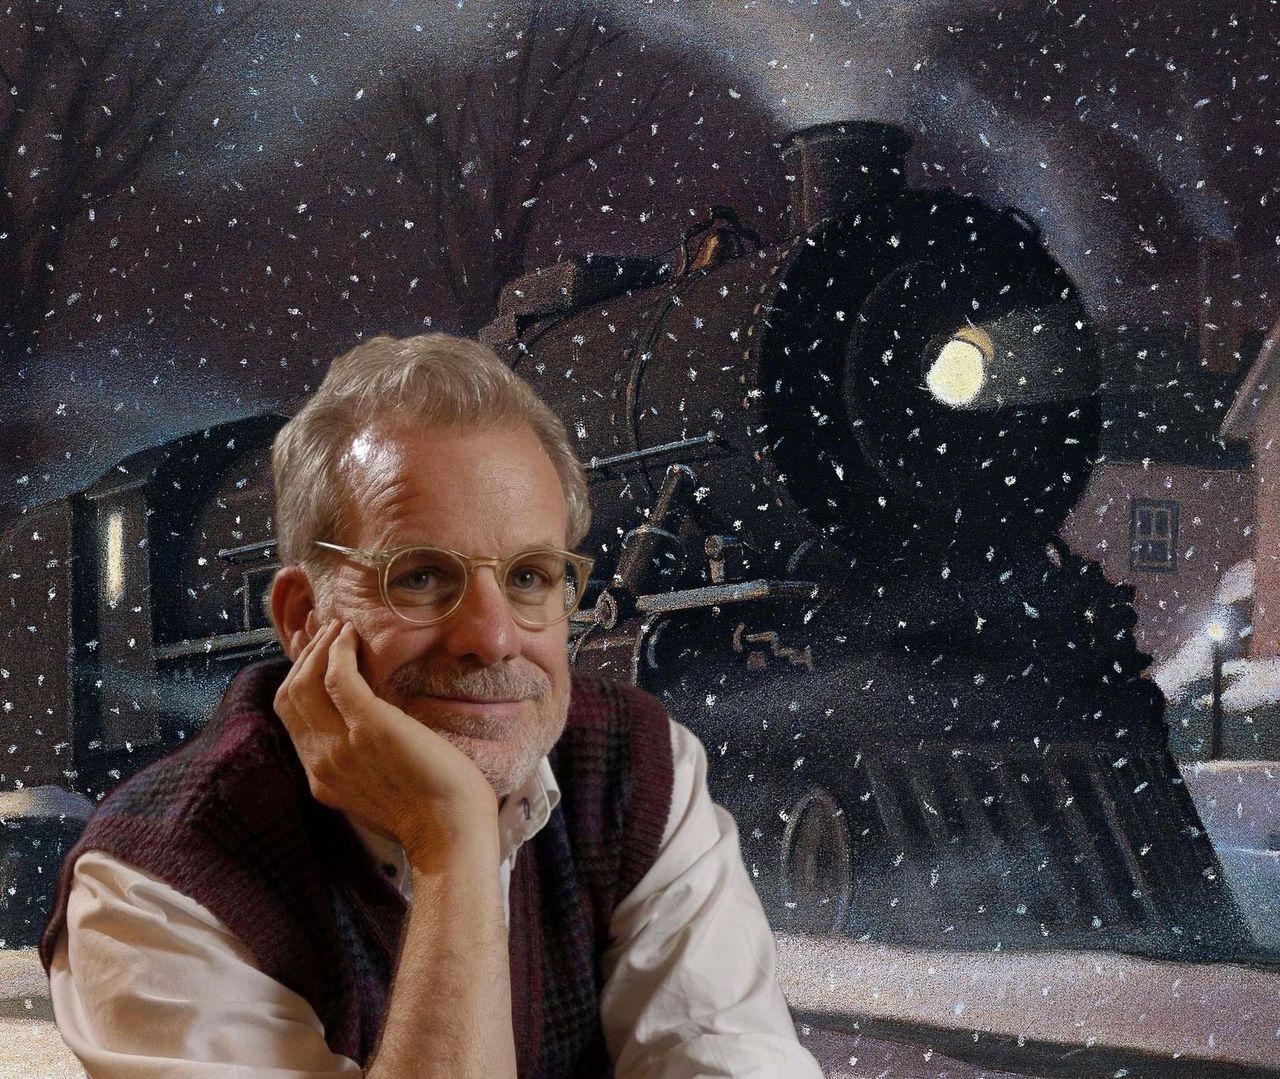 The Polar Express Author Chris Van Allsburg Brings Early